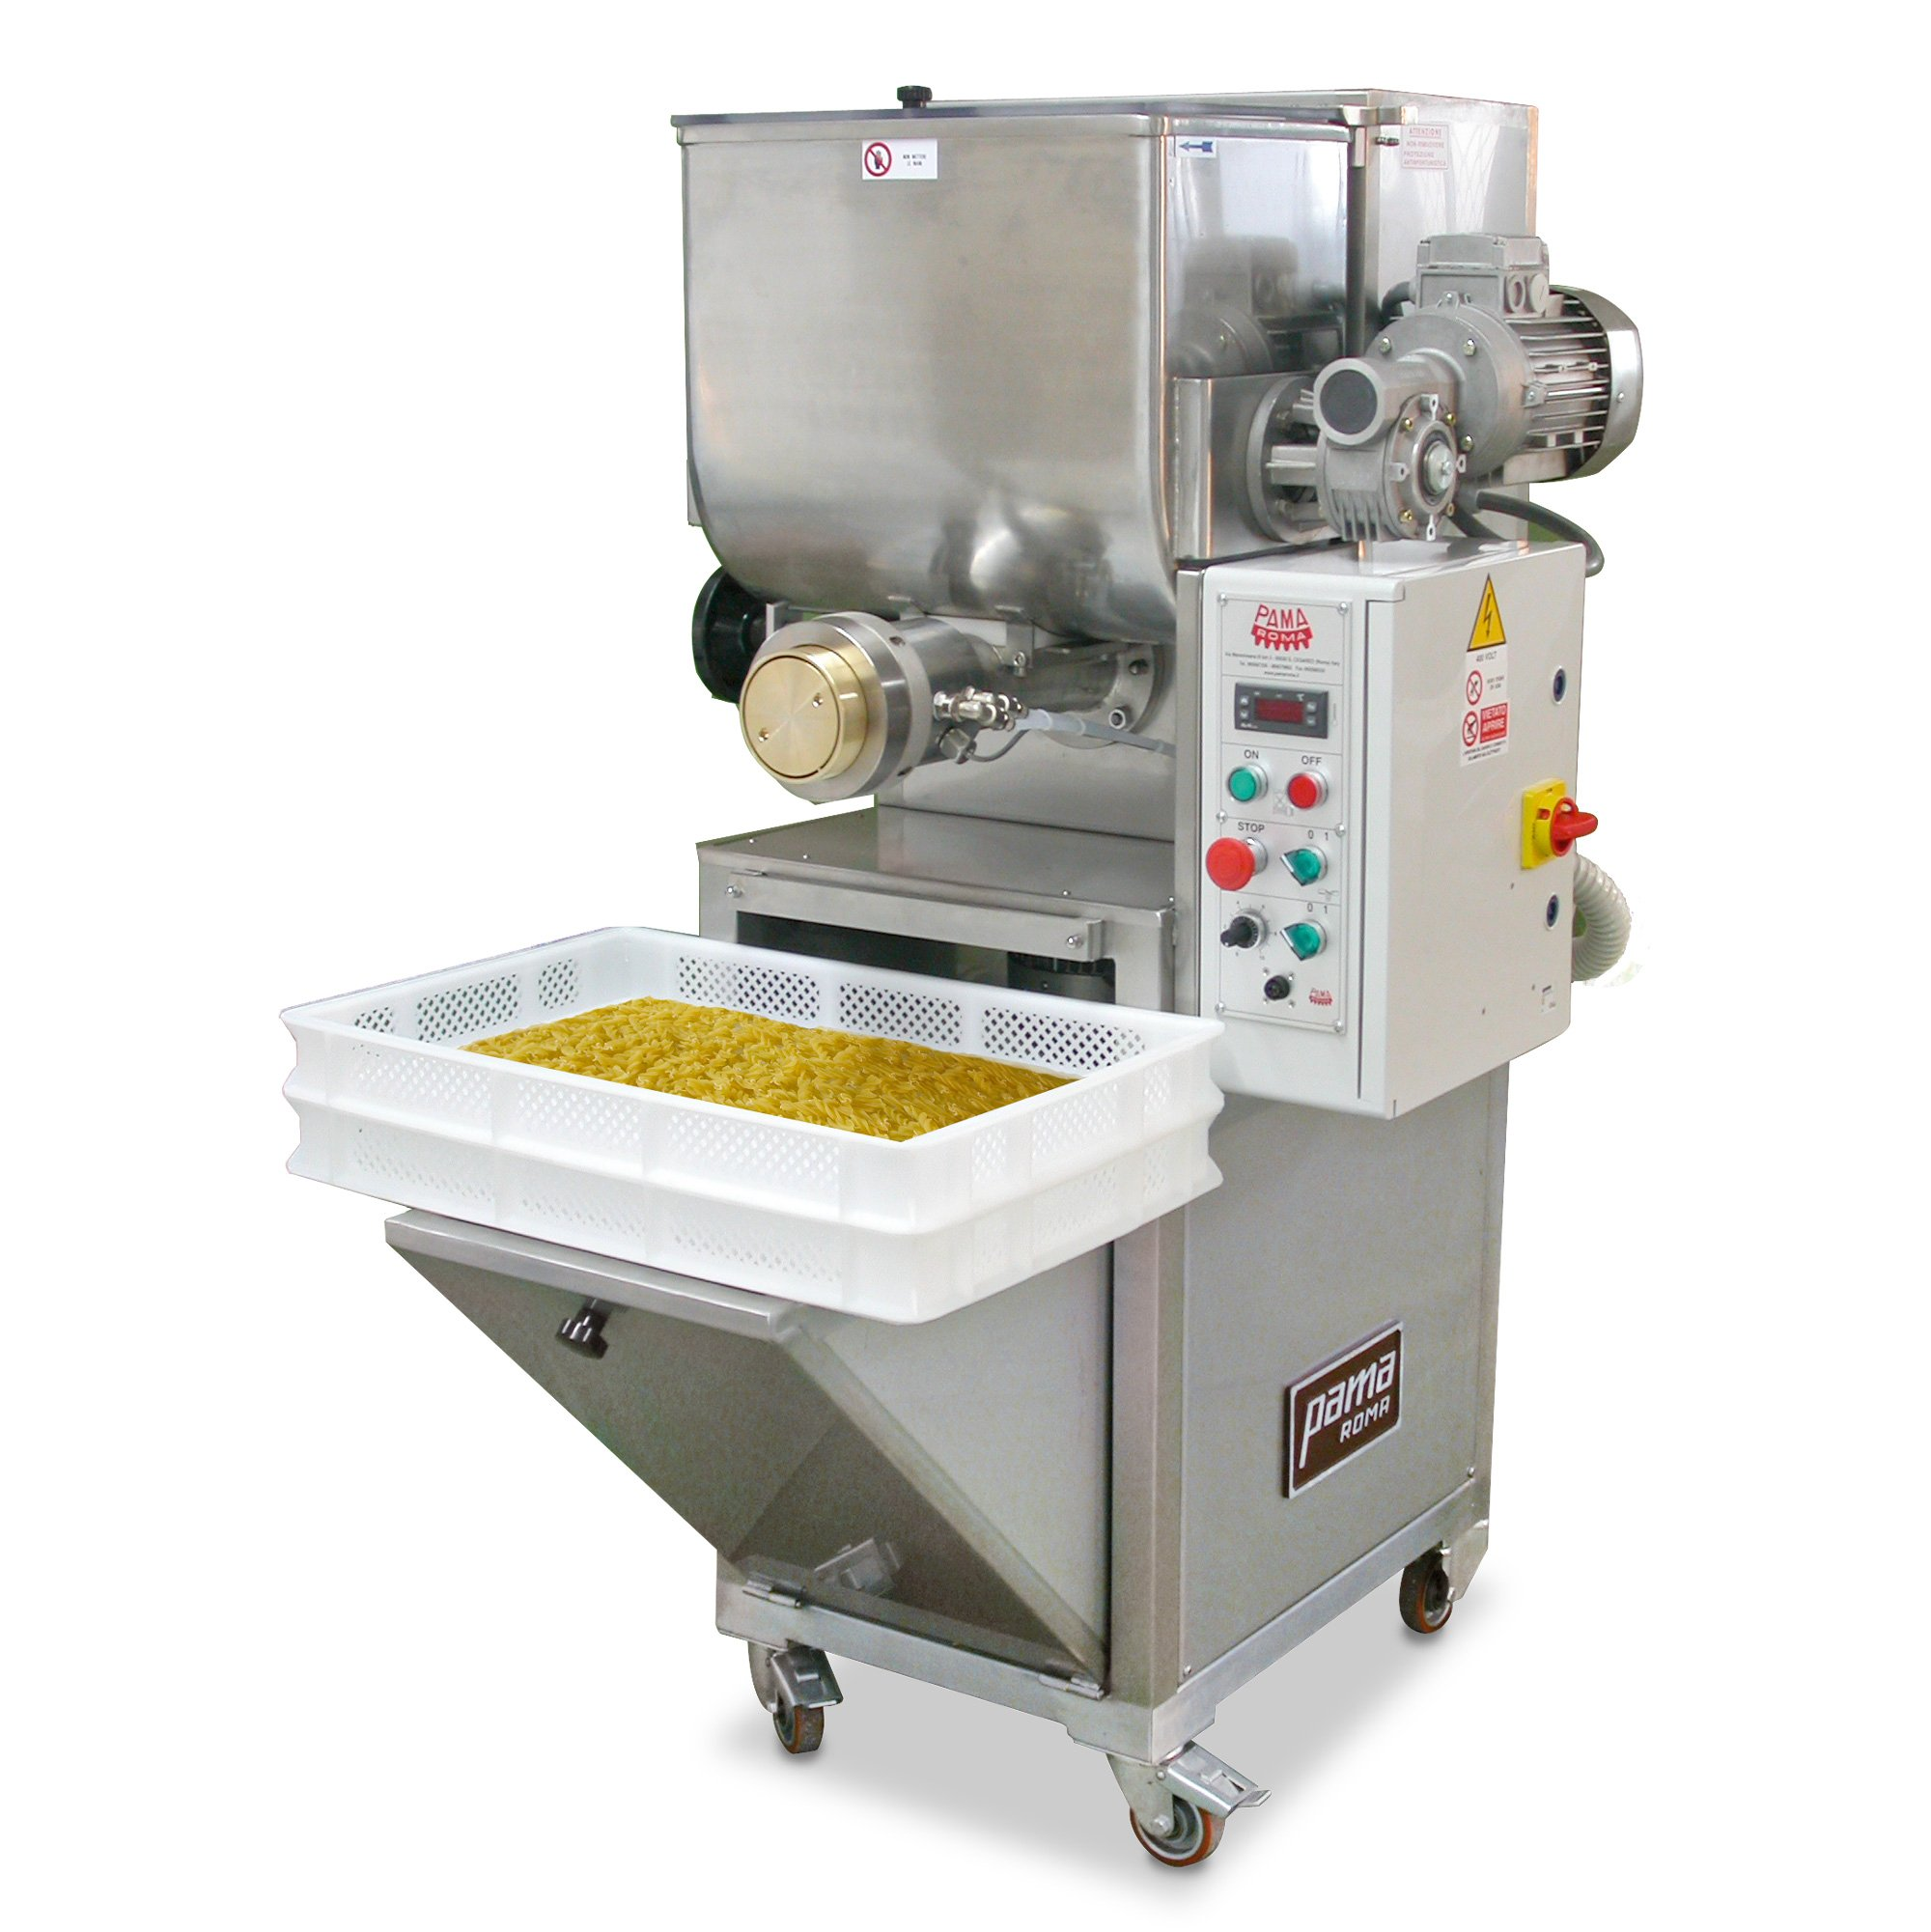 Macchina impastatrice per pasta fresca da 30 kg/h